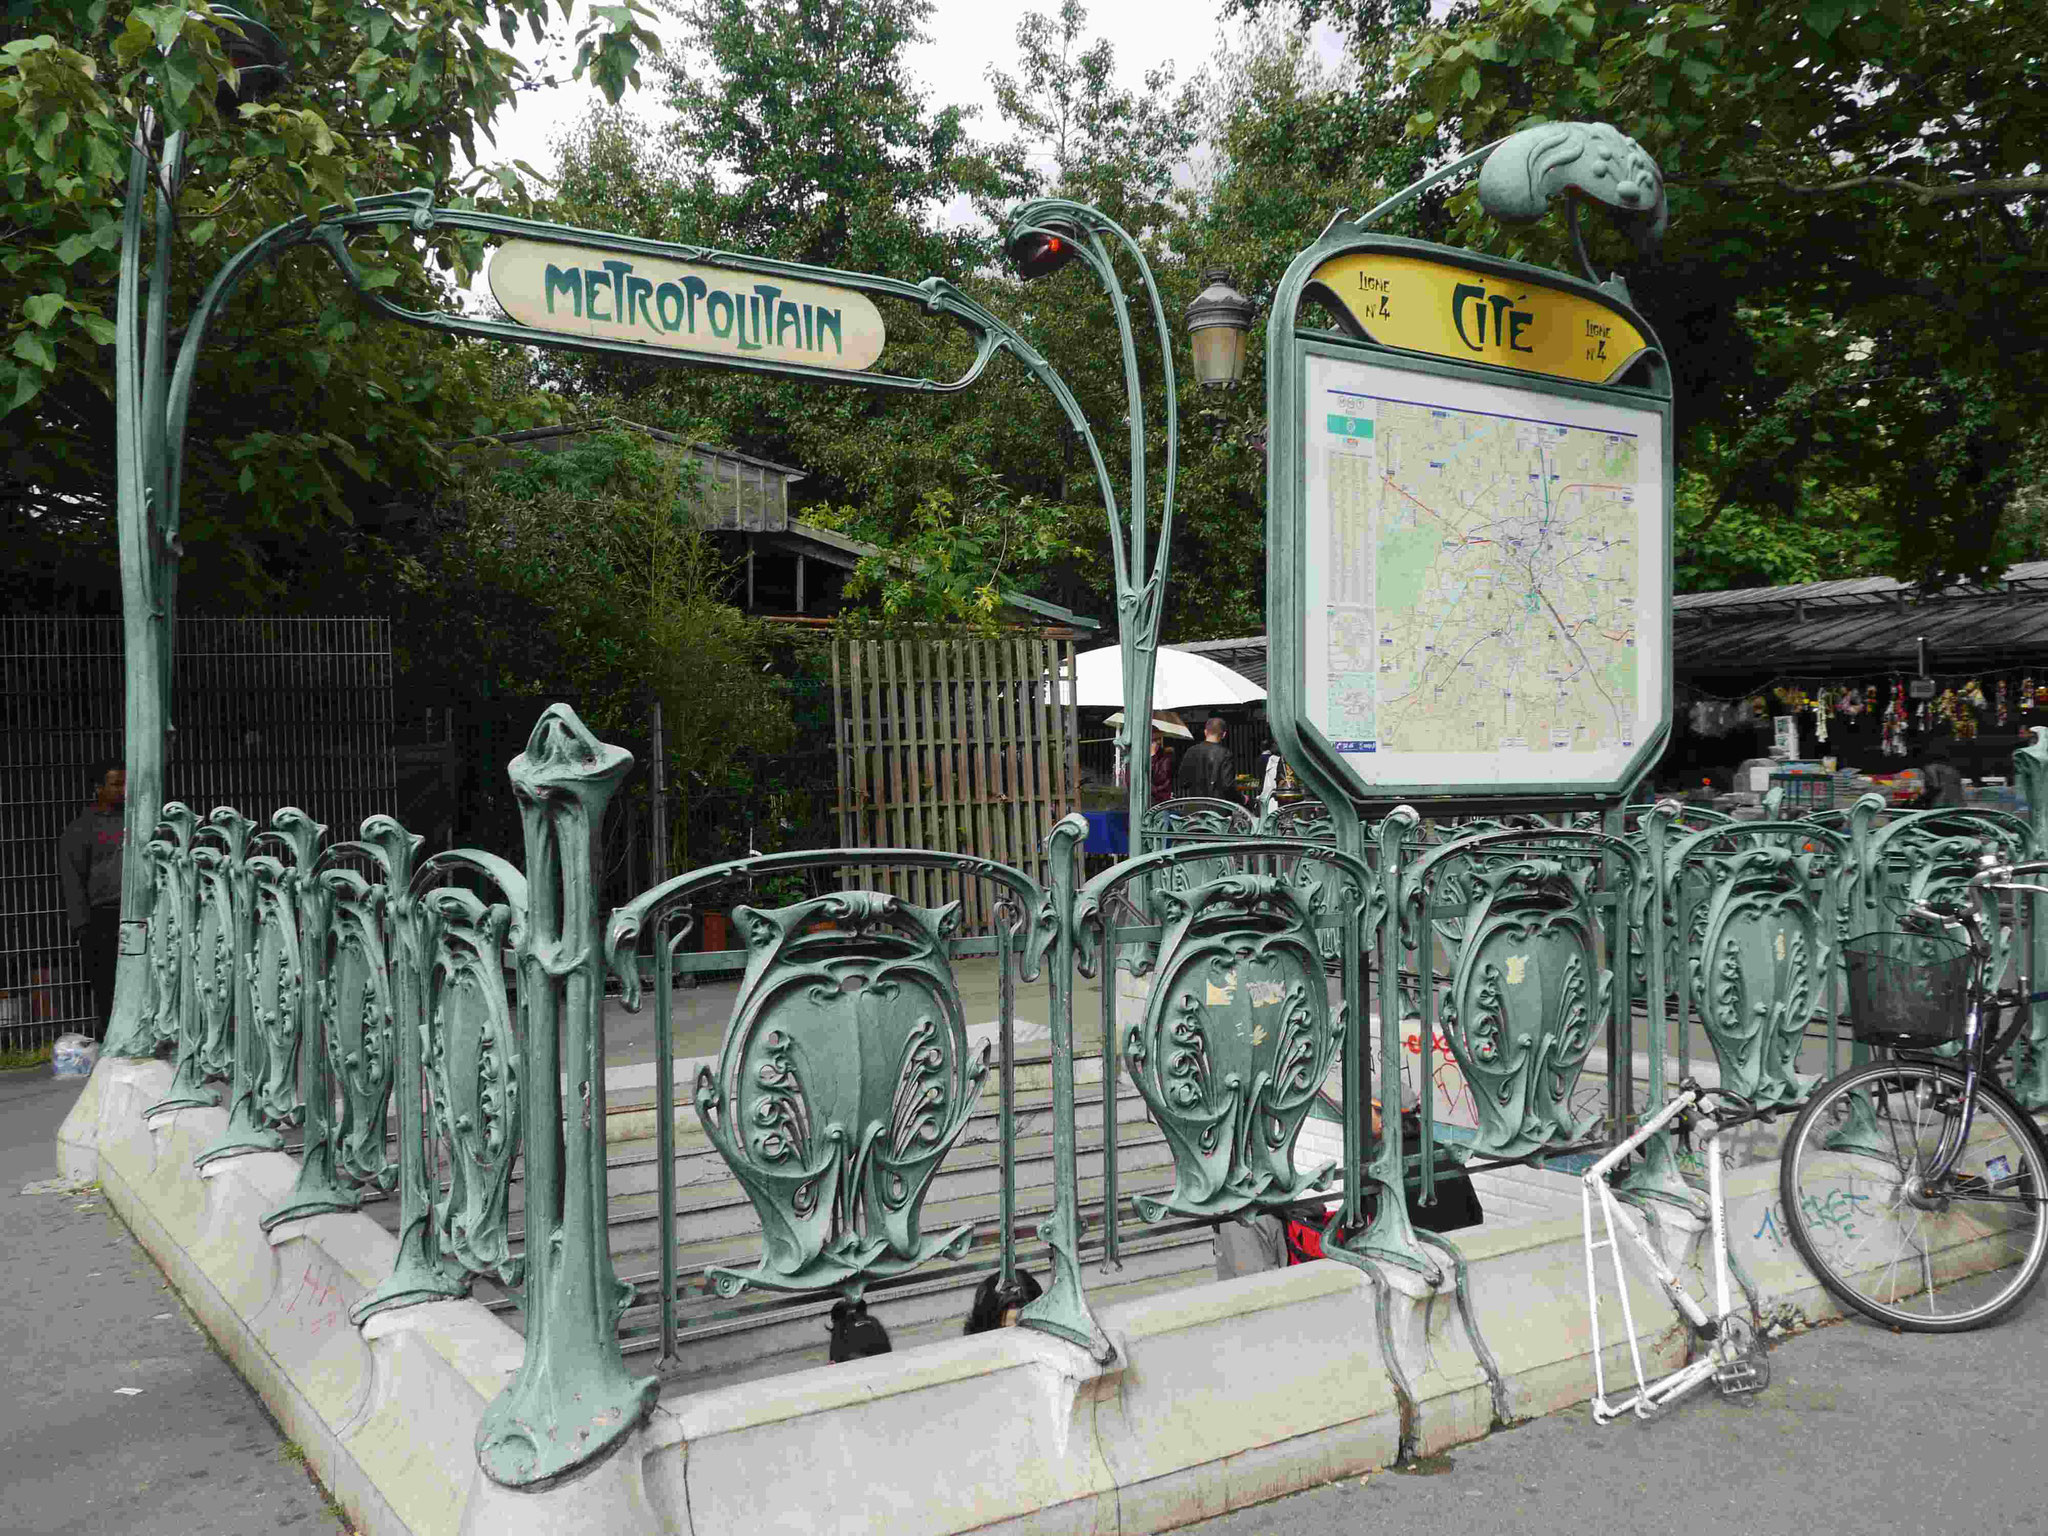 Hector Guimar: Metroeingänge in Paris